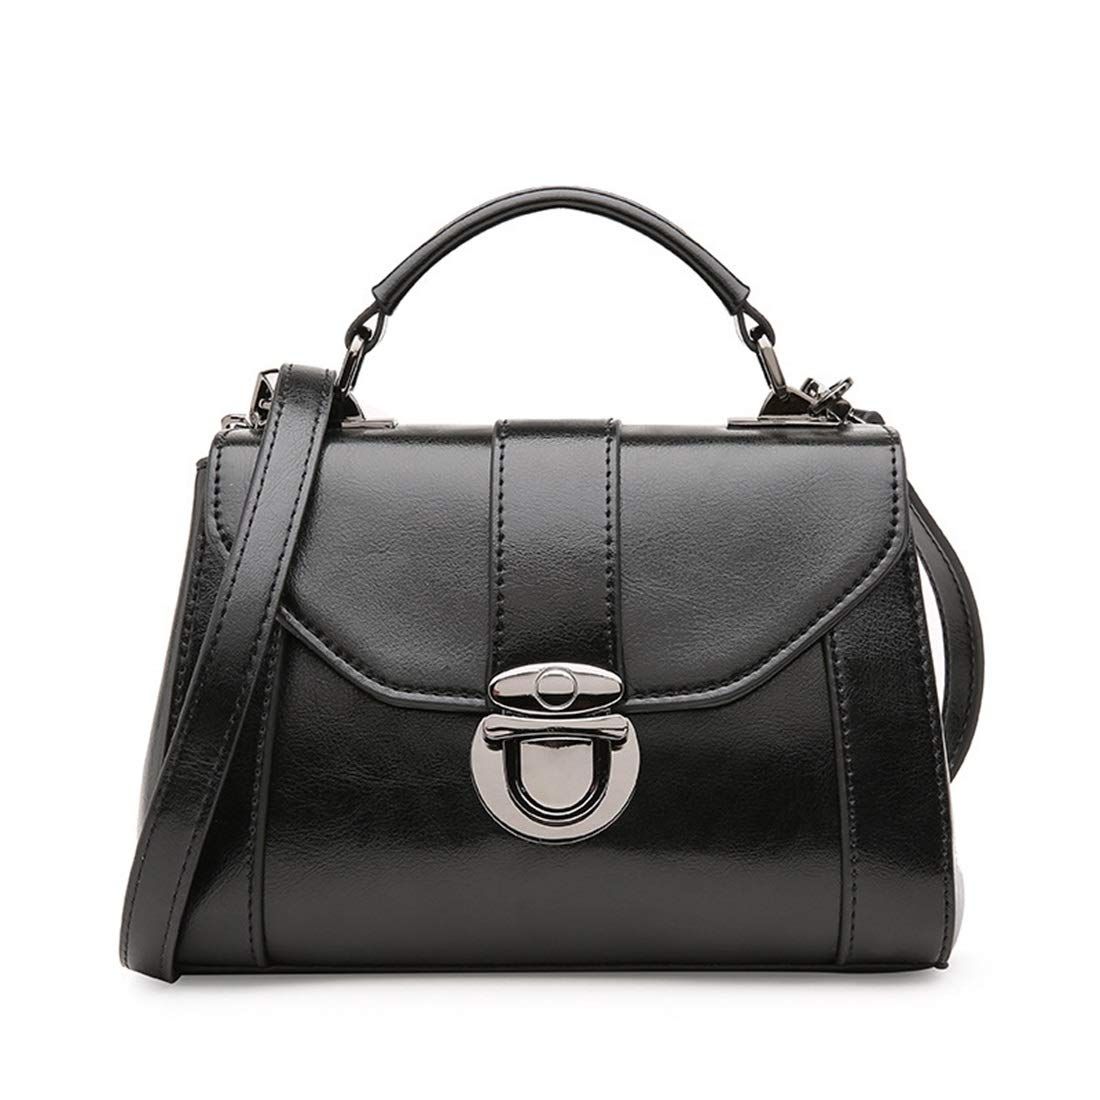 Carriemeow Simple Retro Lock Square Leather Shoulder Bag Messenger Bag Caramel Color